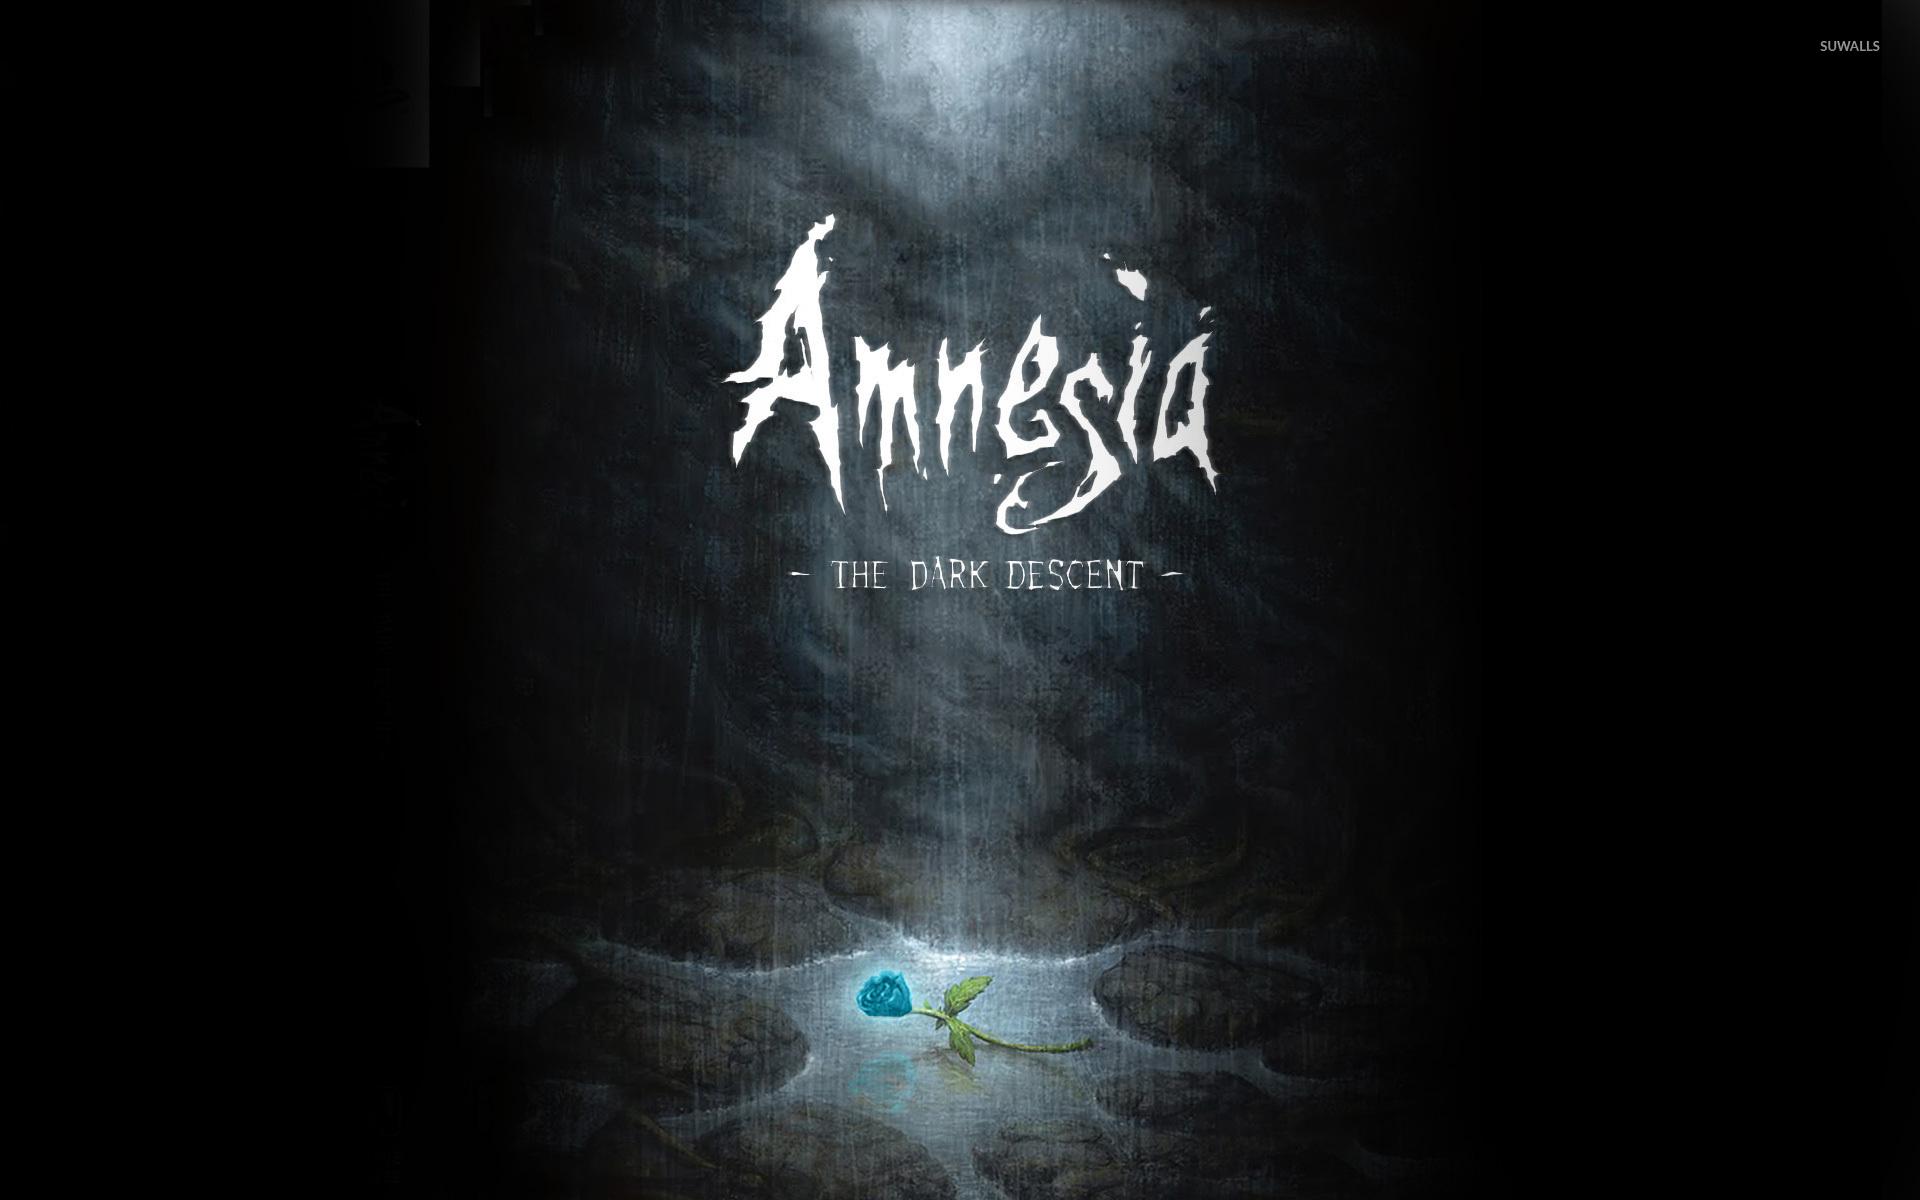 Amnesia The Dark Descent 3 Wallpaper Game Wallpapers 8791